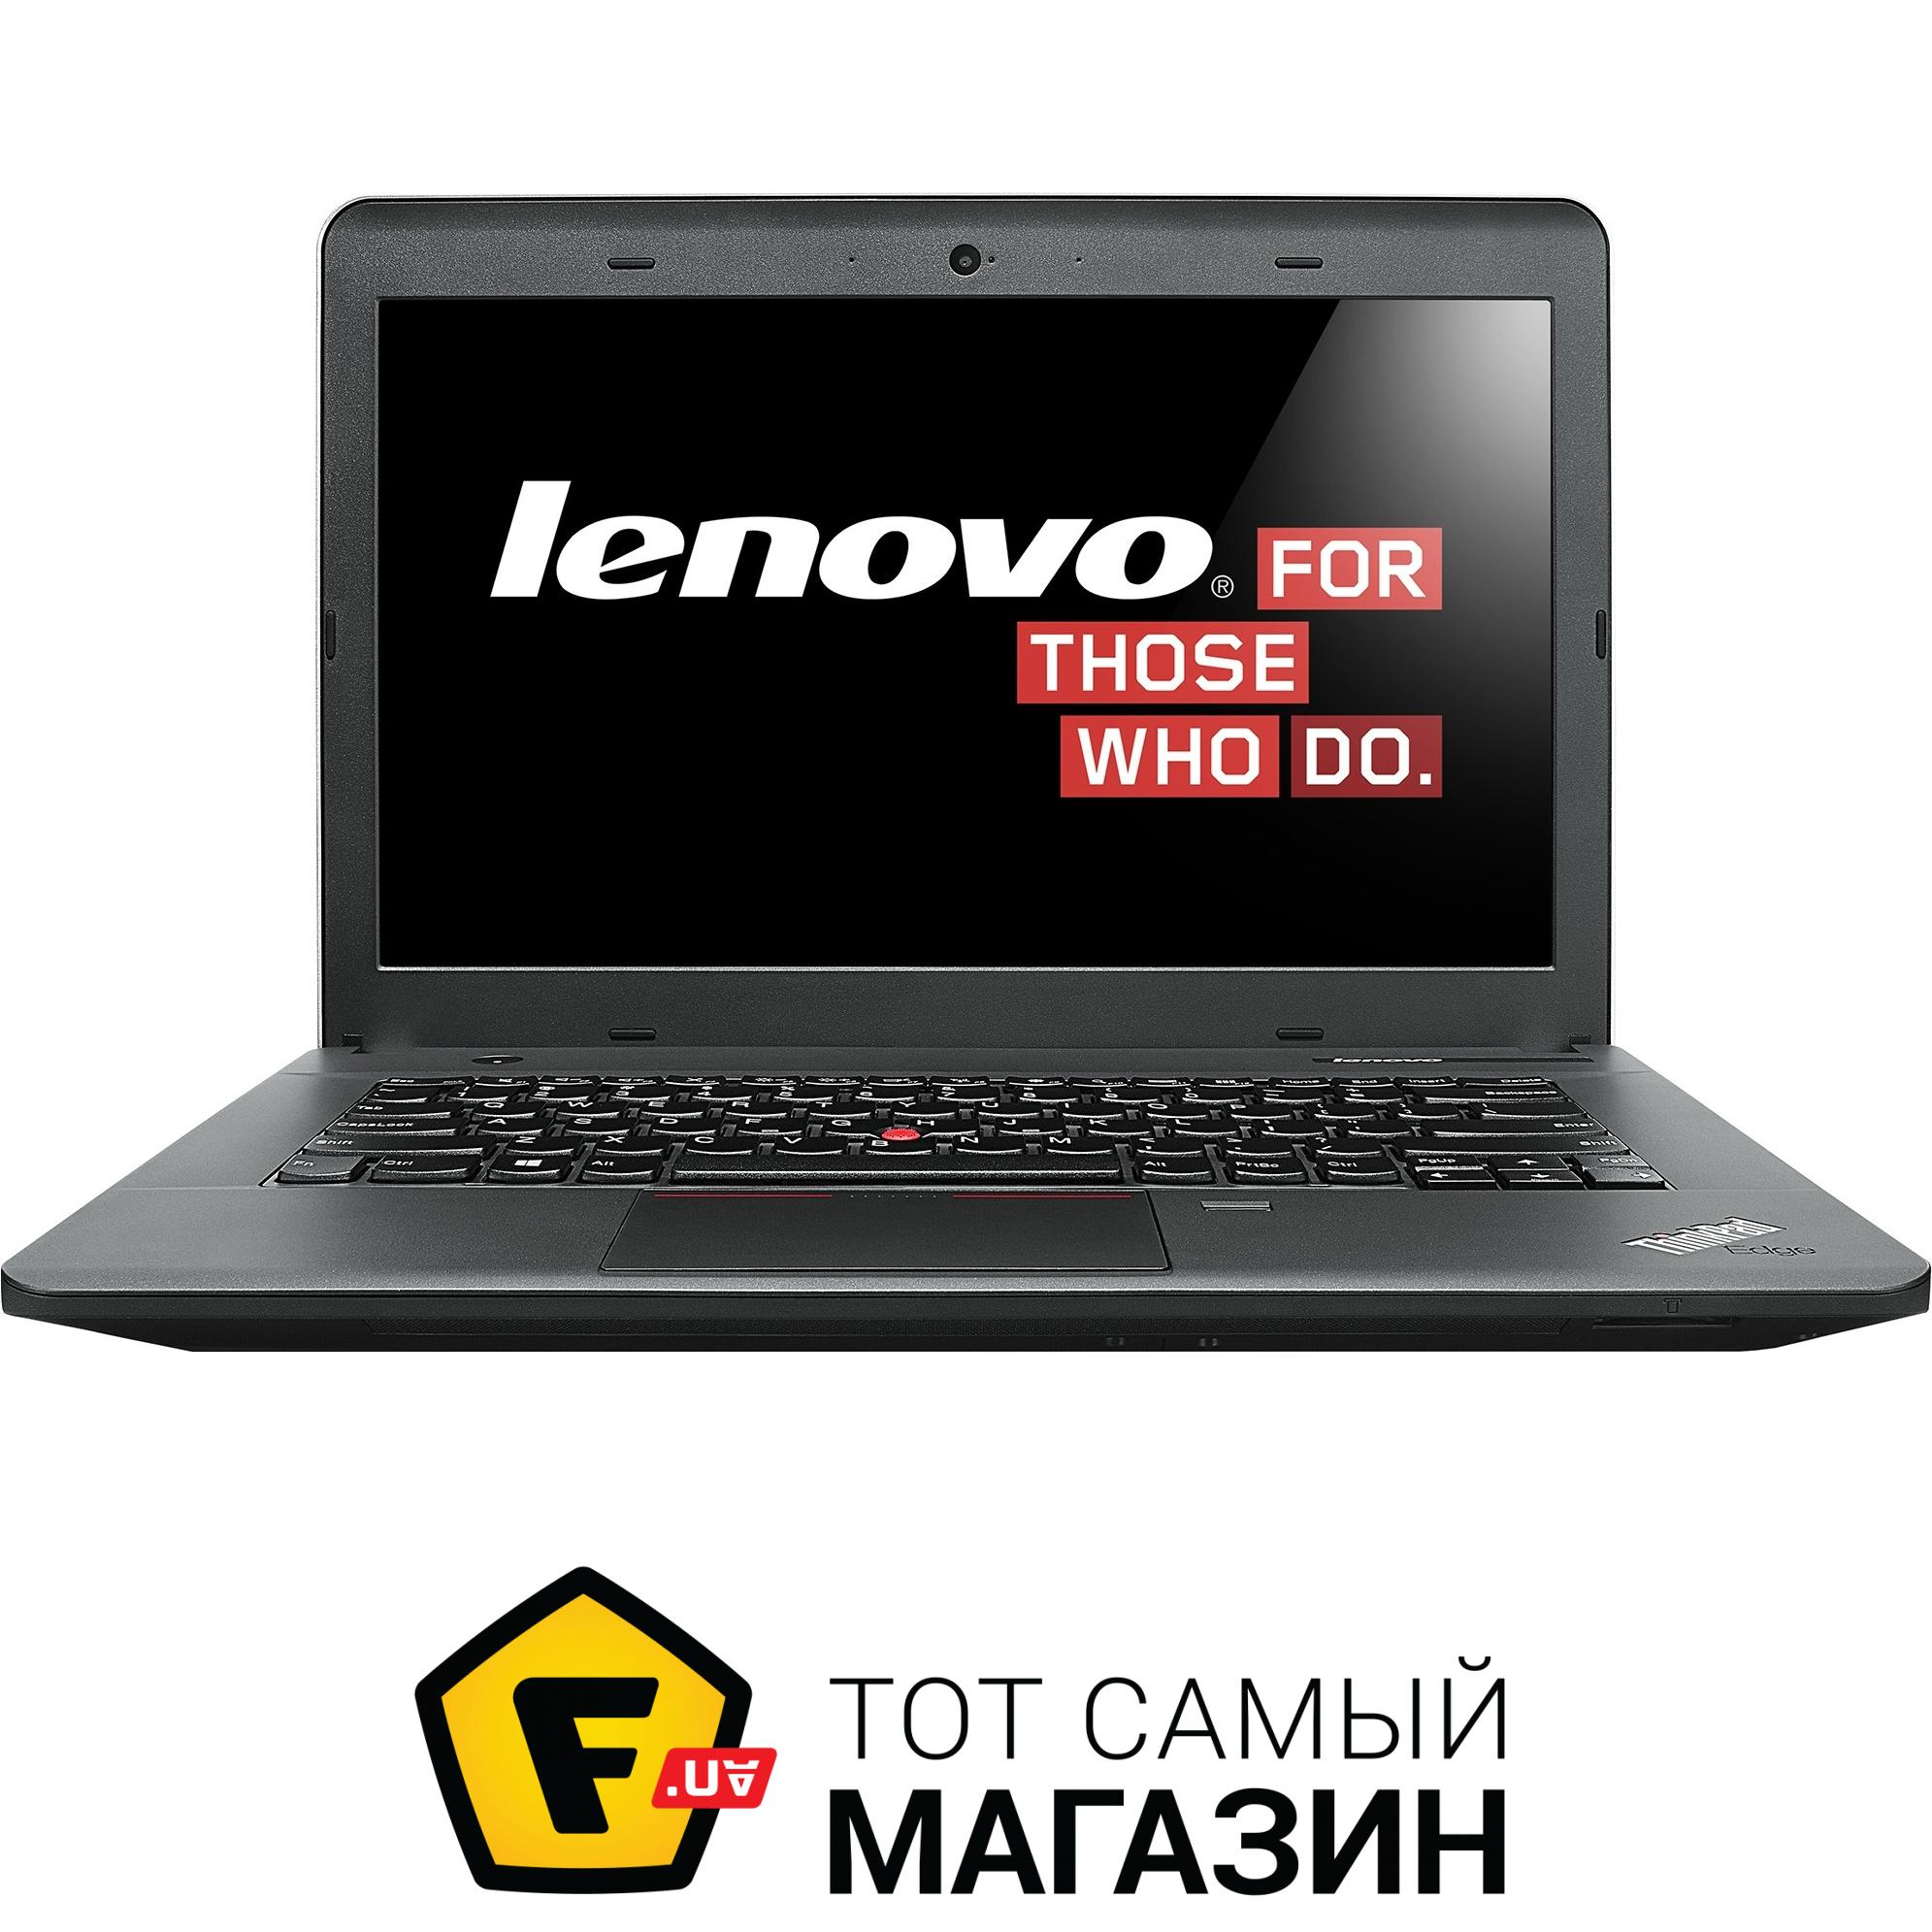 Lenovo ThinkPad Edge E440 Monitor Drivers Download Free